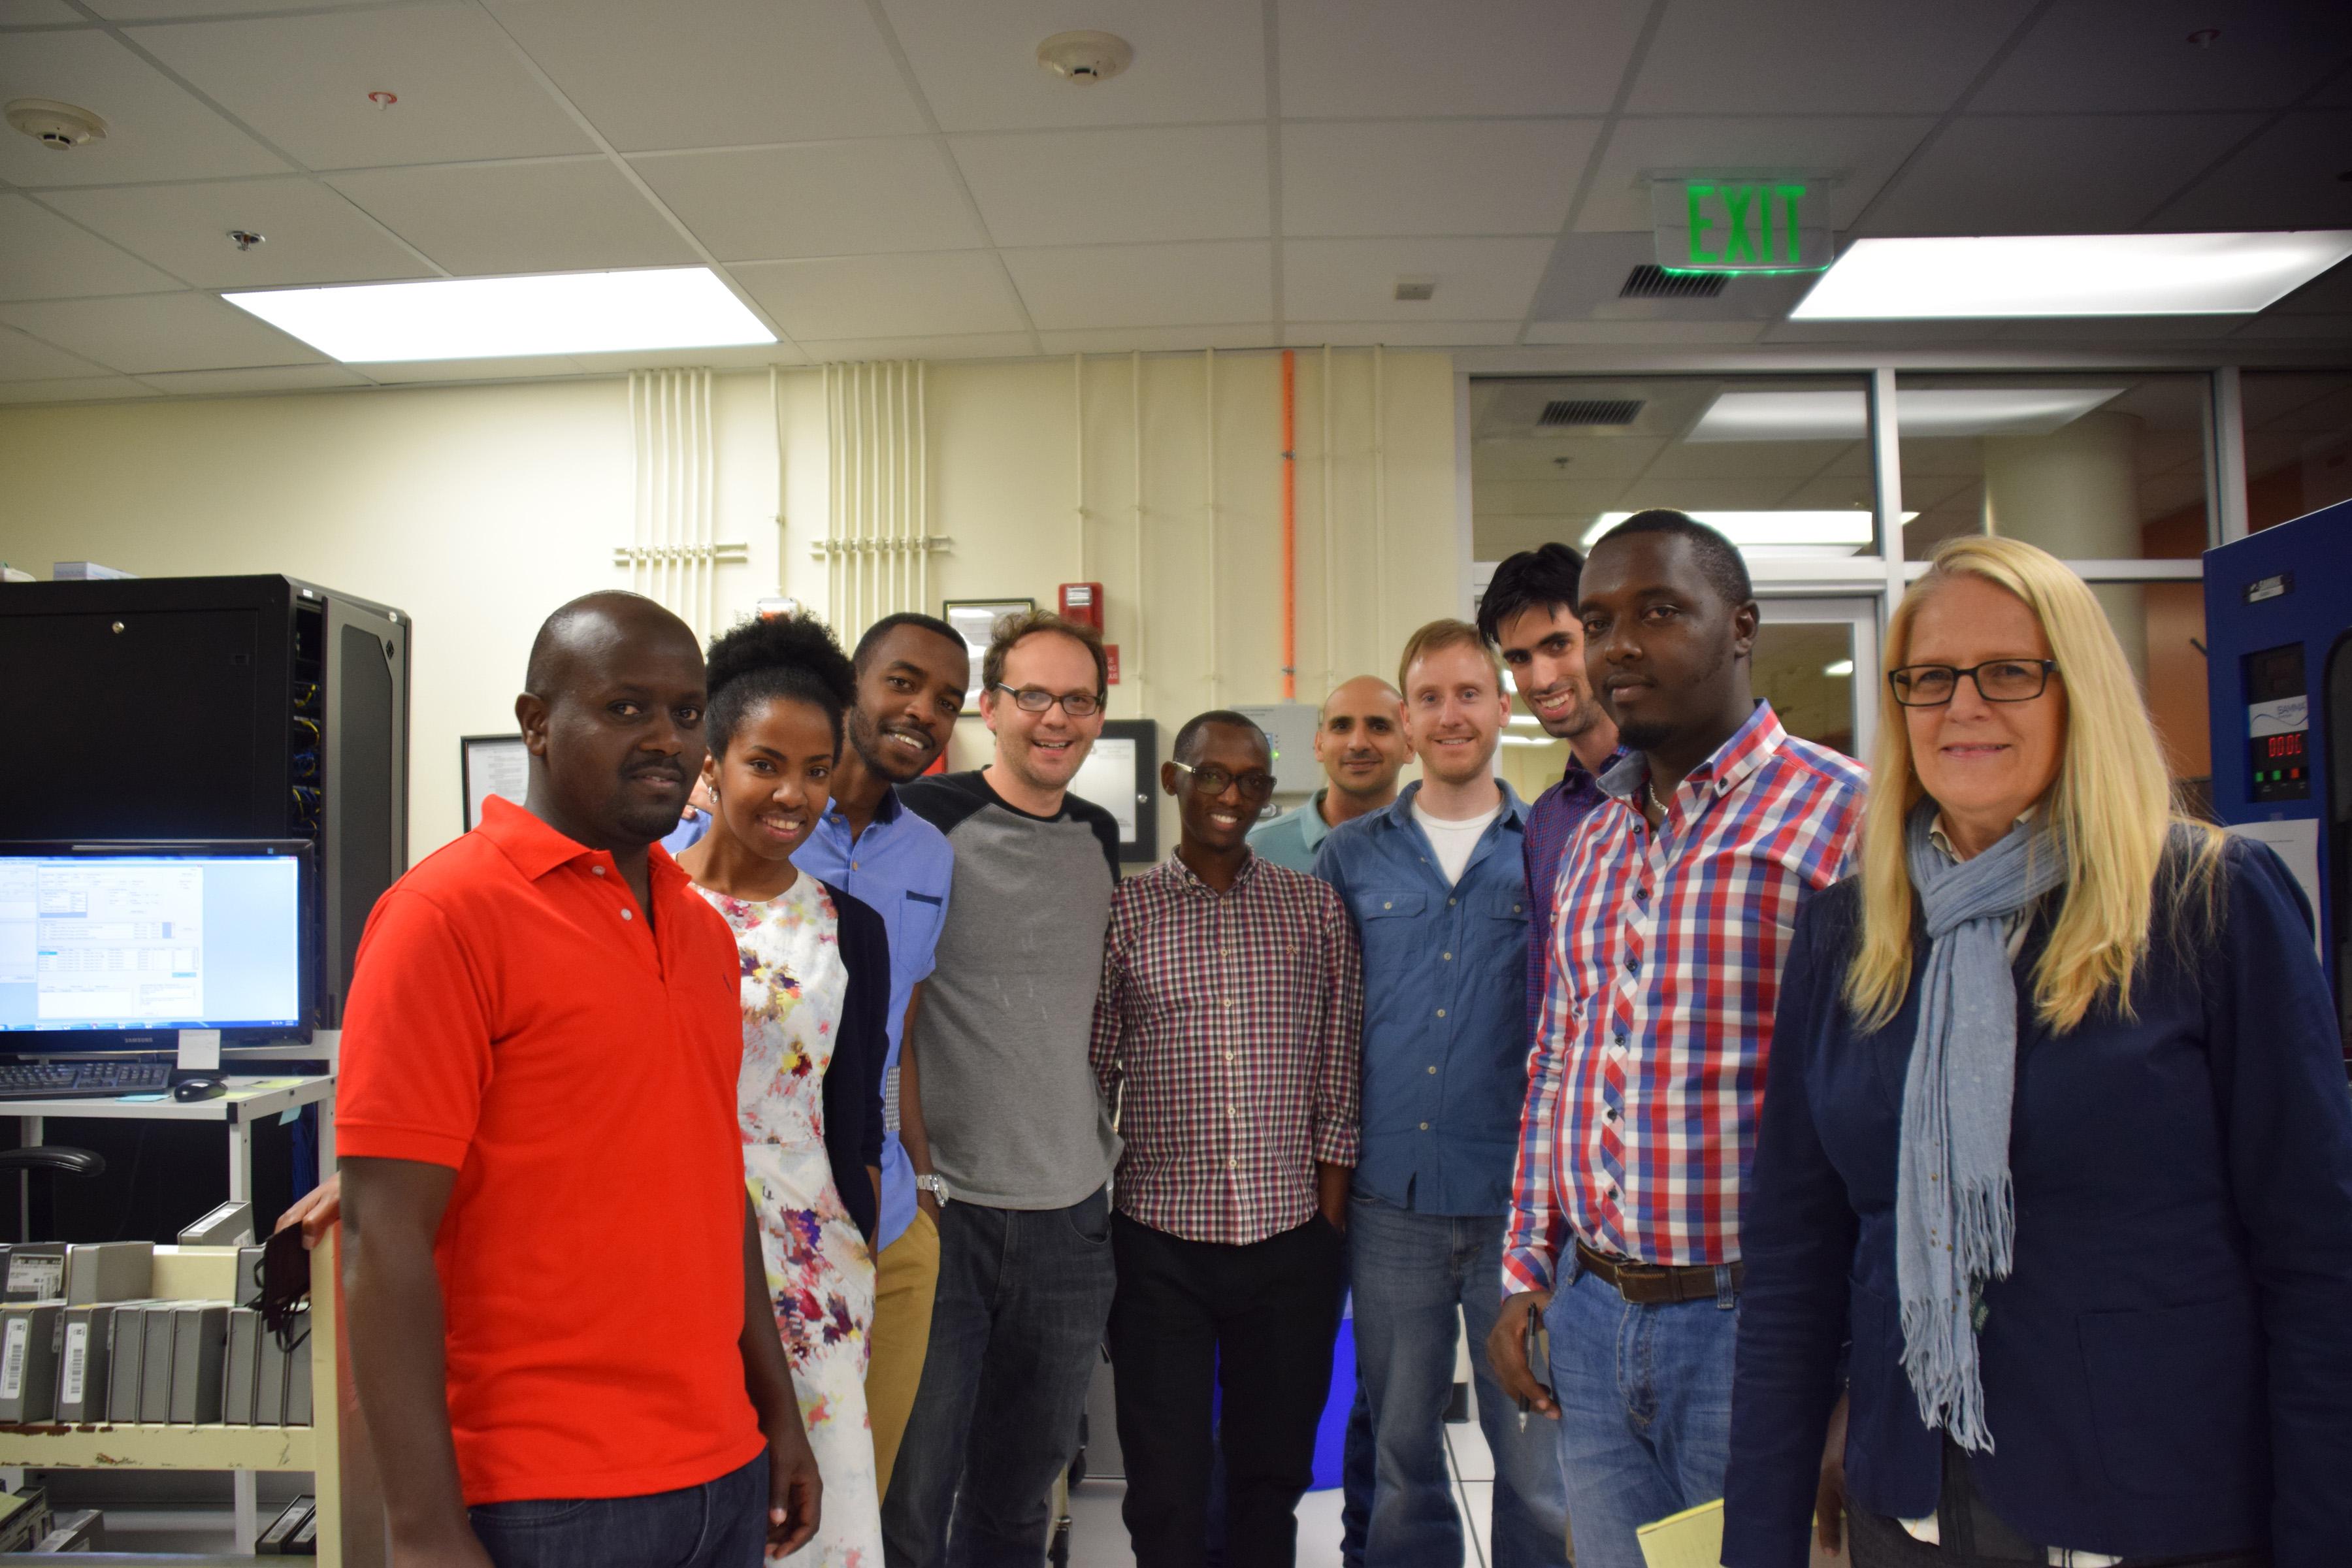 L-R: Clement Muhire; Consolée Uwamariya; Fabrice Musafiri; Ryan Fenton-Strauss; Patrick Nkubana; Shiraz Bhathena; Zachary Goode; Remington Dewan; Claver Irakoze; Anita Pace.